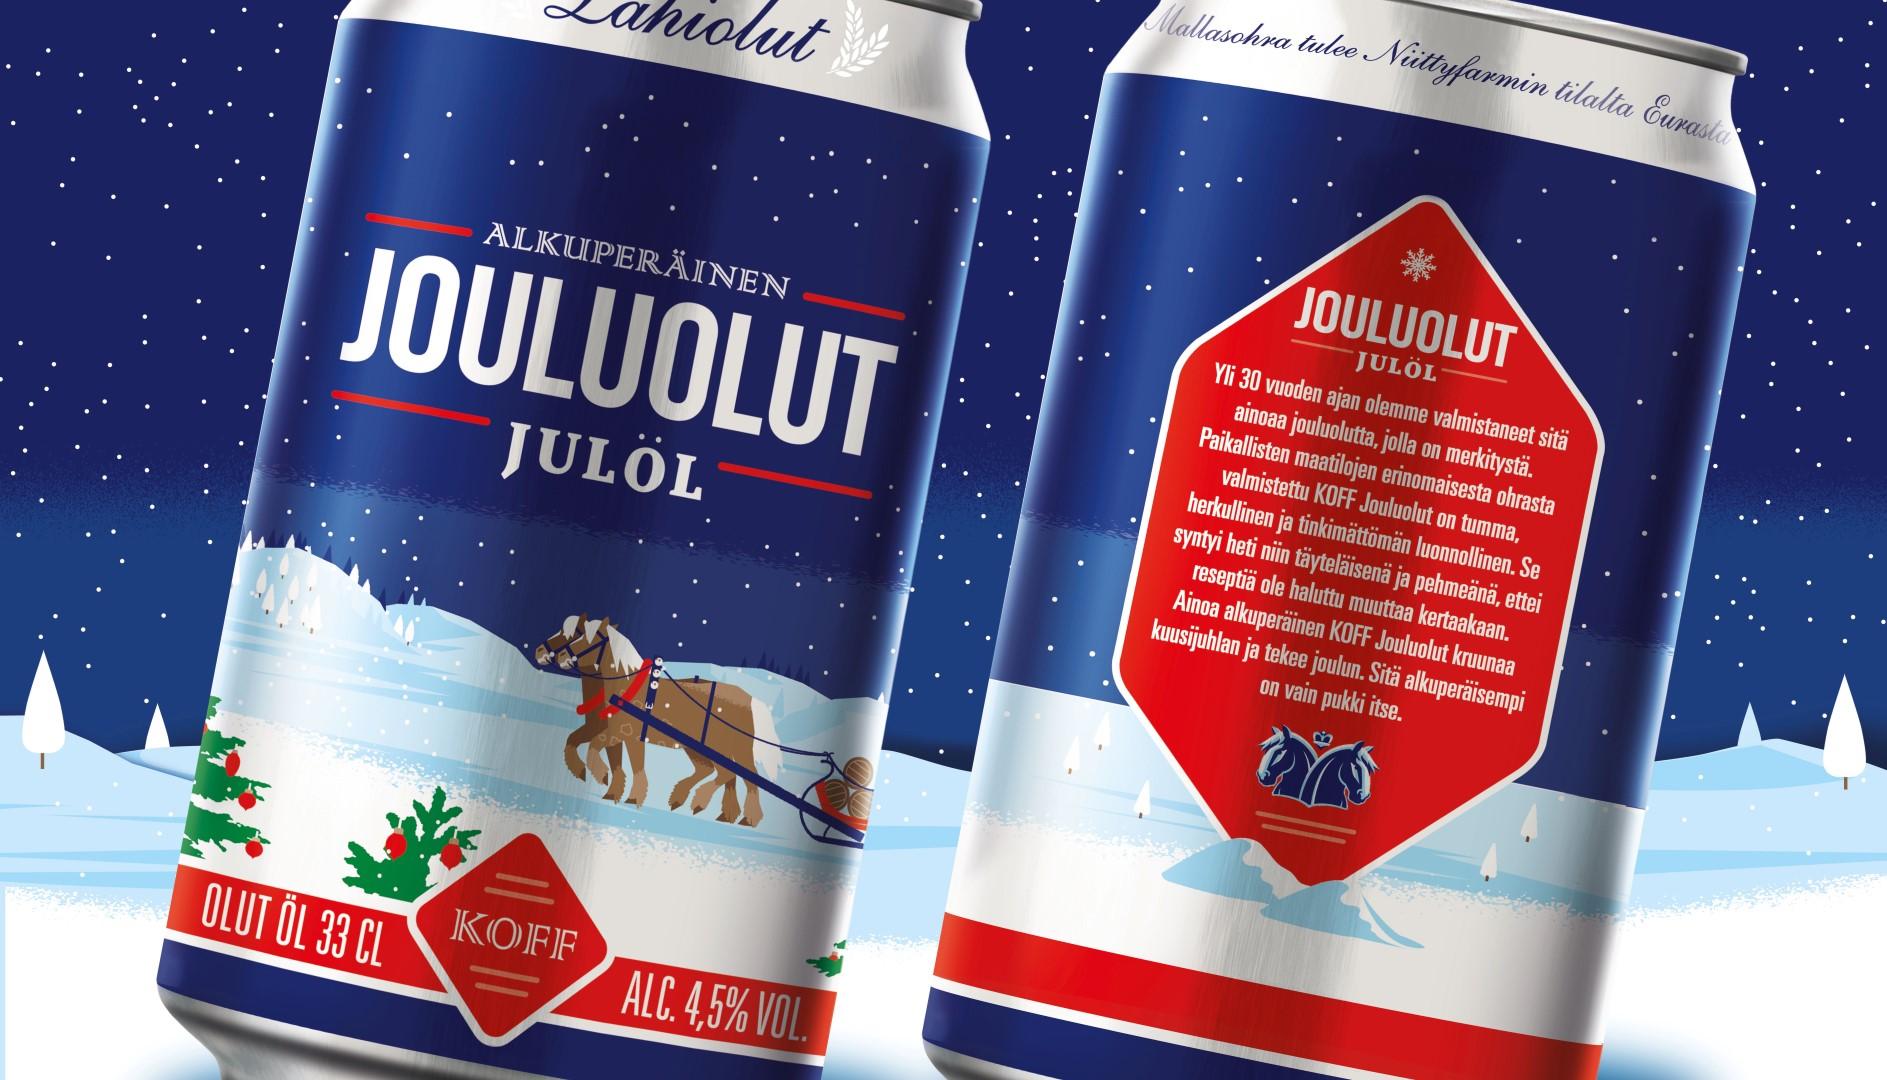 Bluemarlin Brand Design – KOFF Jouluolut